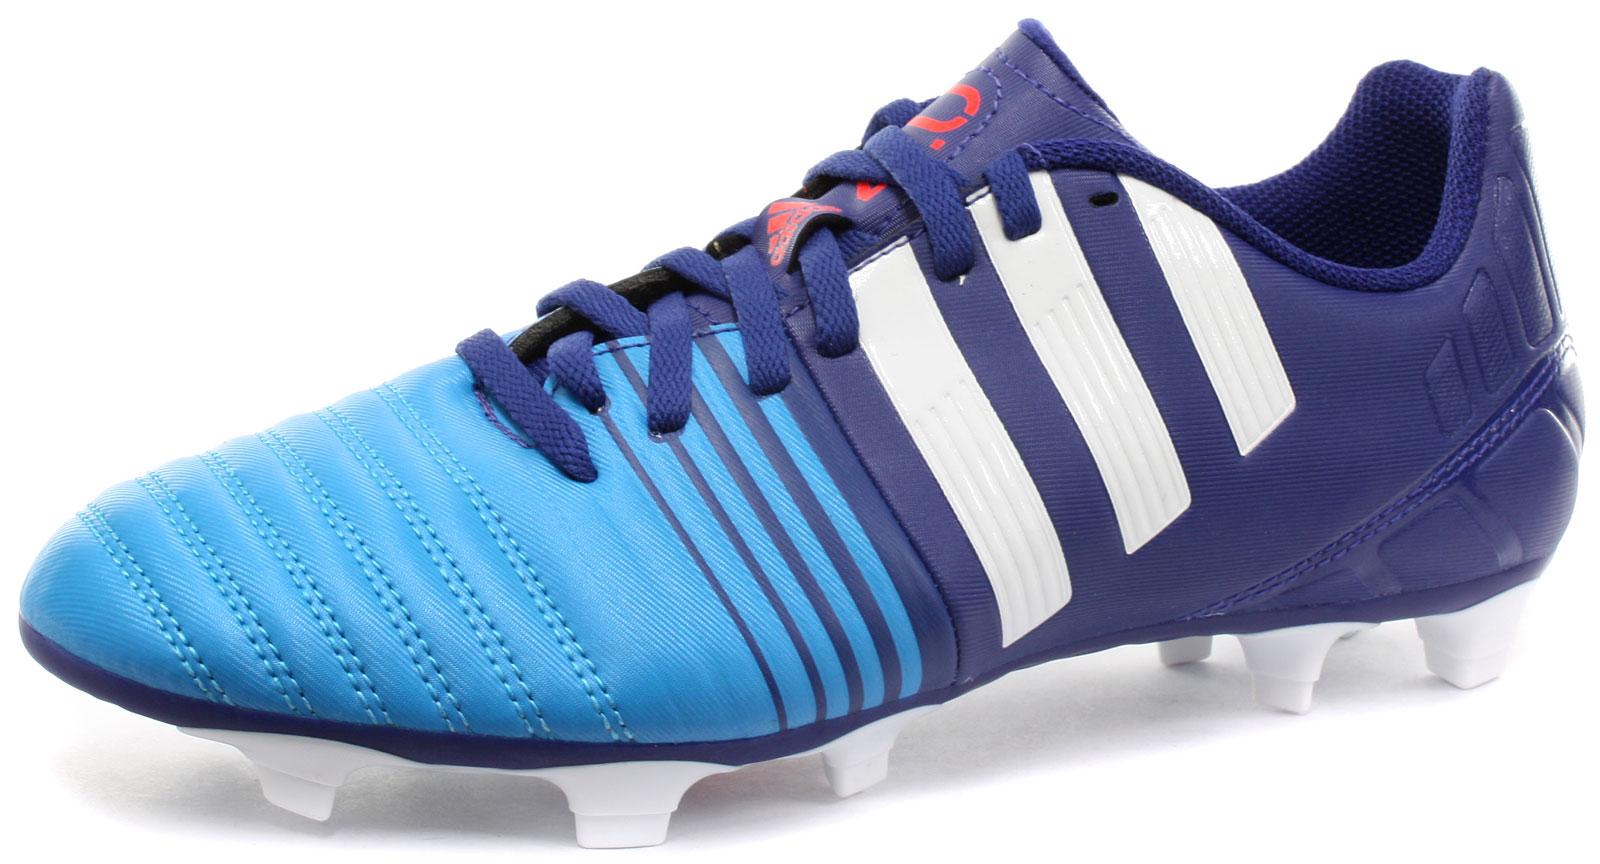 adidas nitrocharge 40 fg mens football boots all sizes